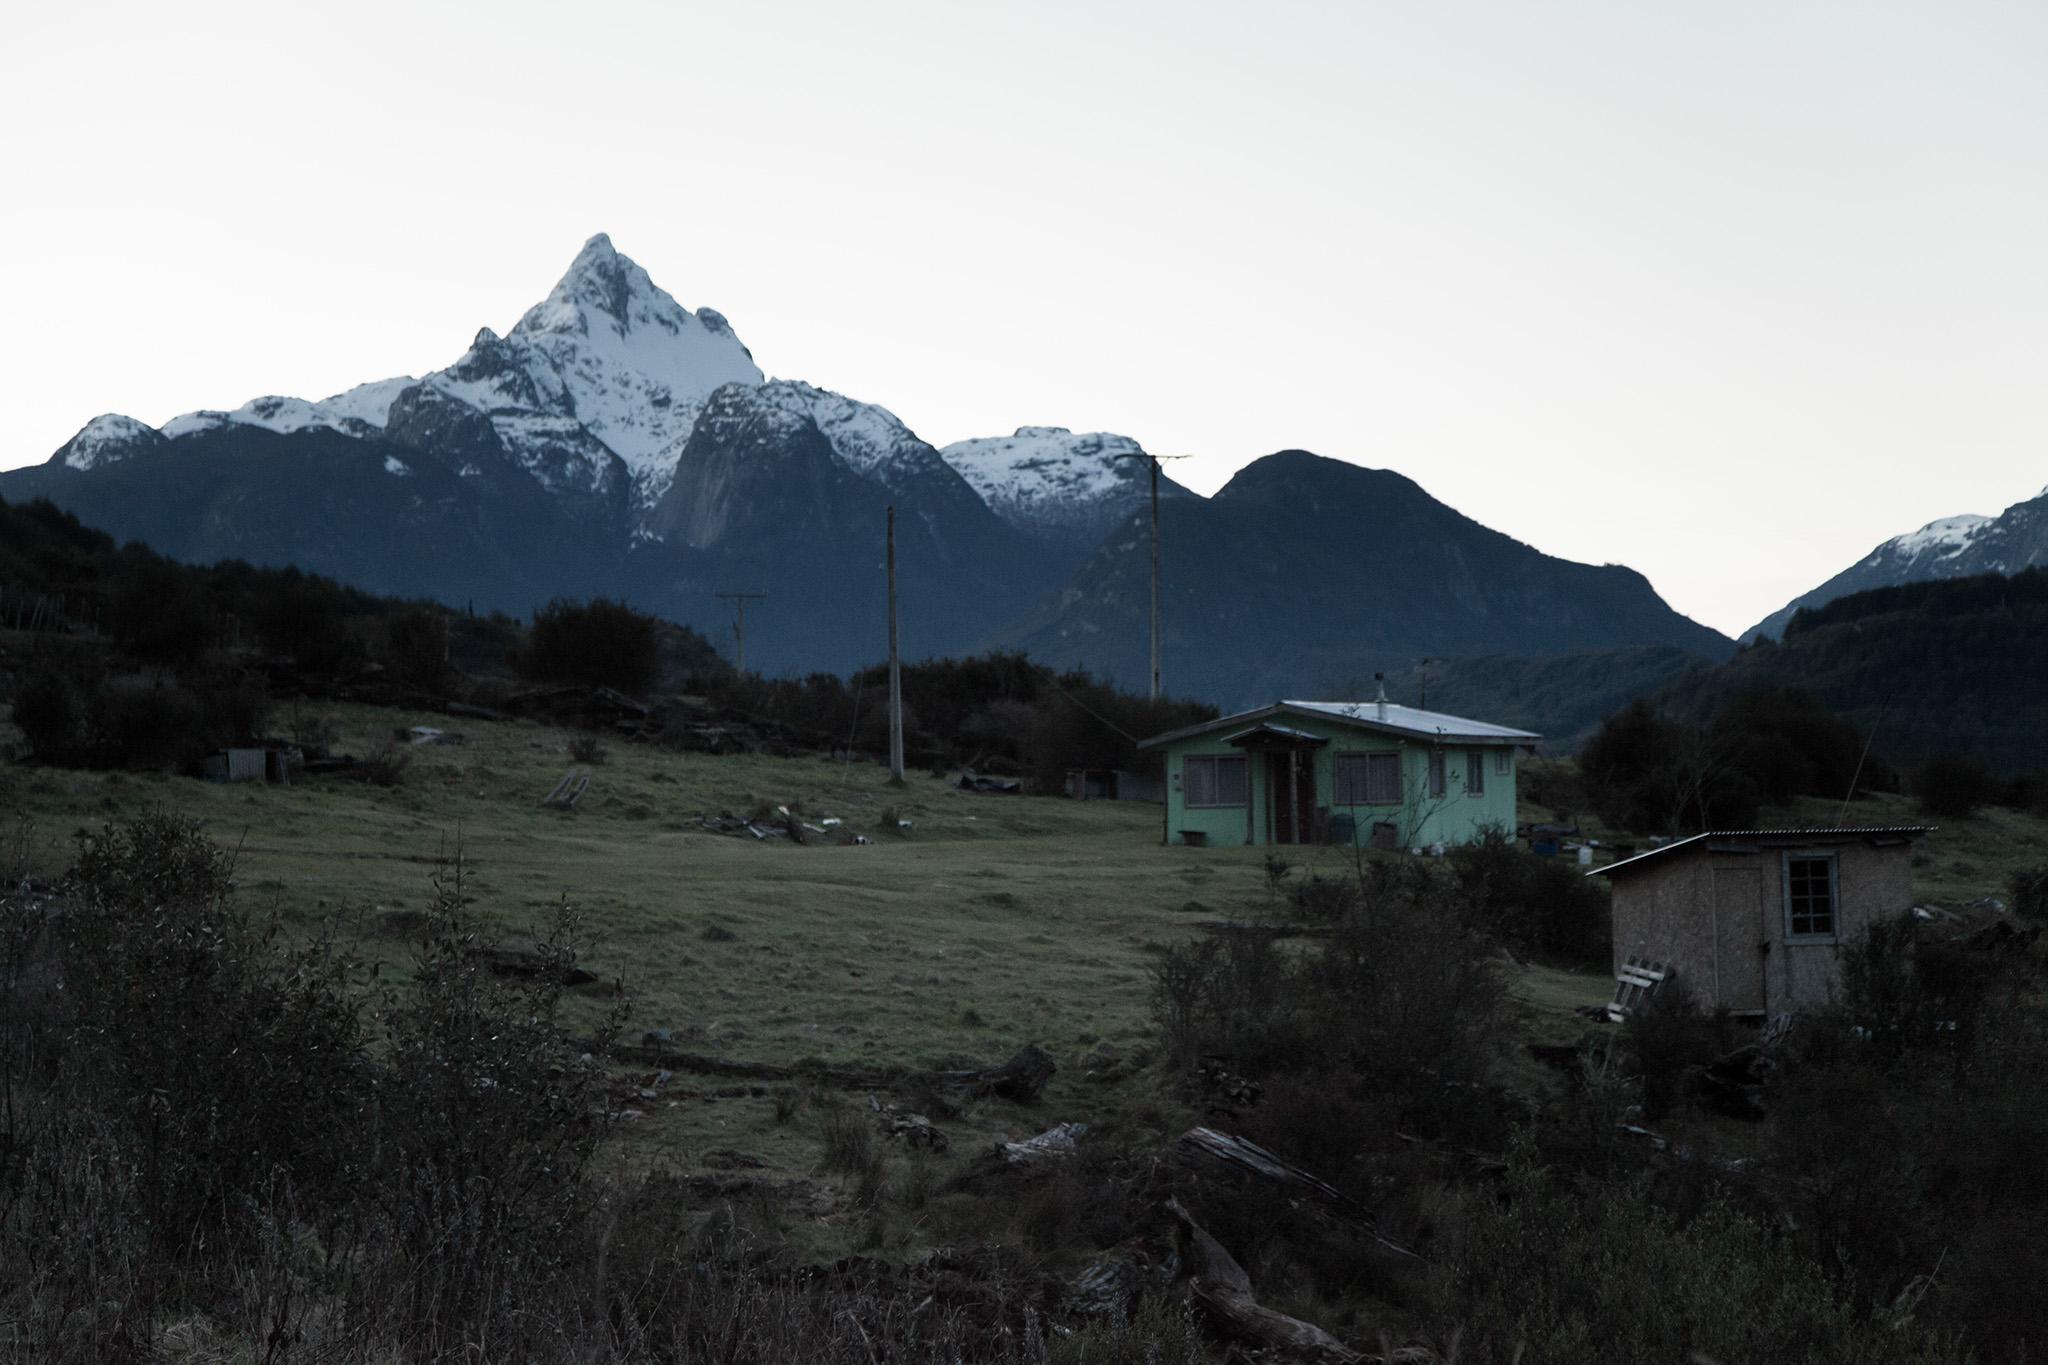 022-TW-Patagonia-140827.jpg